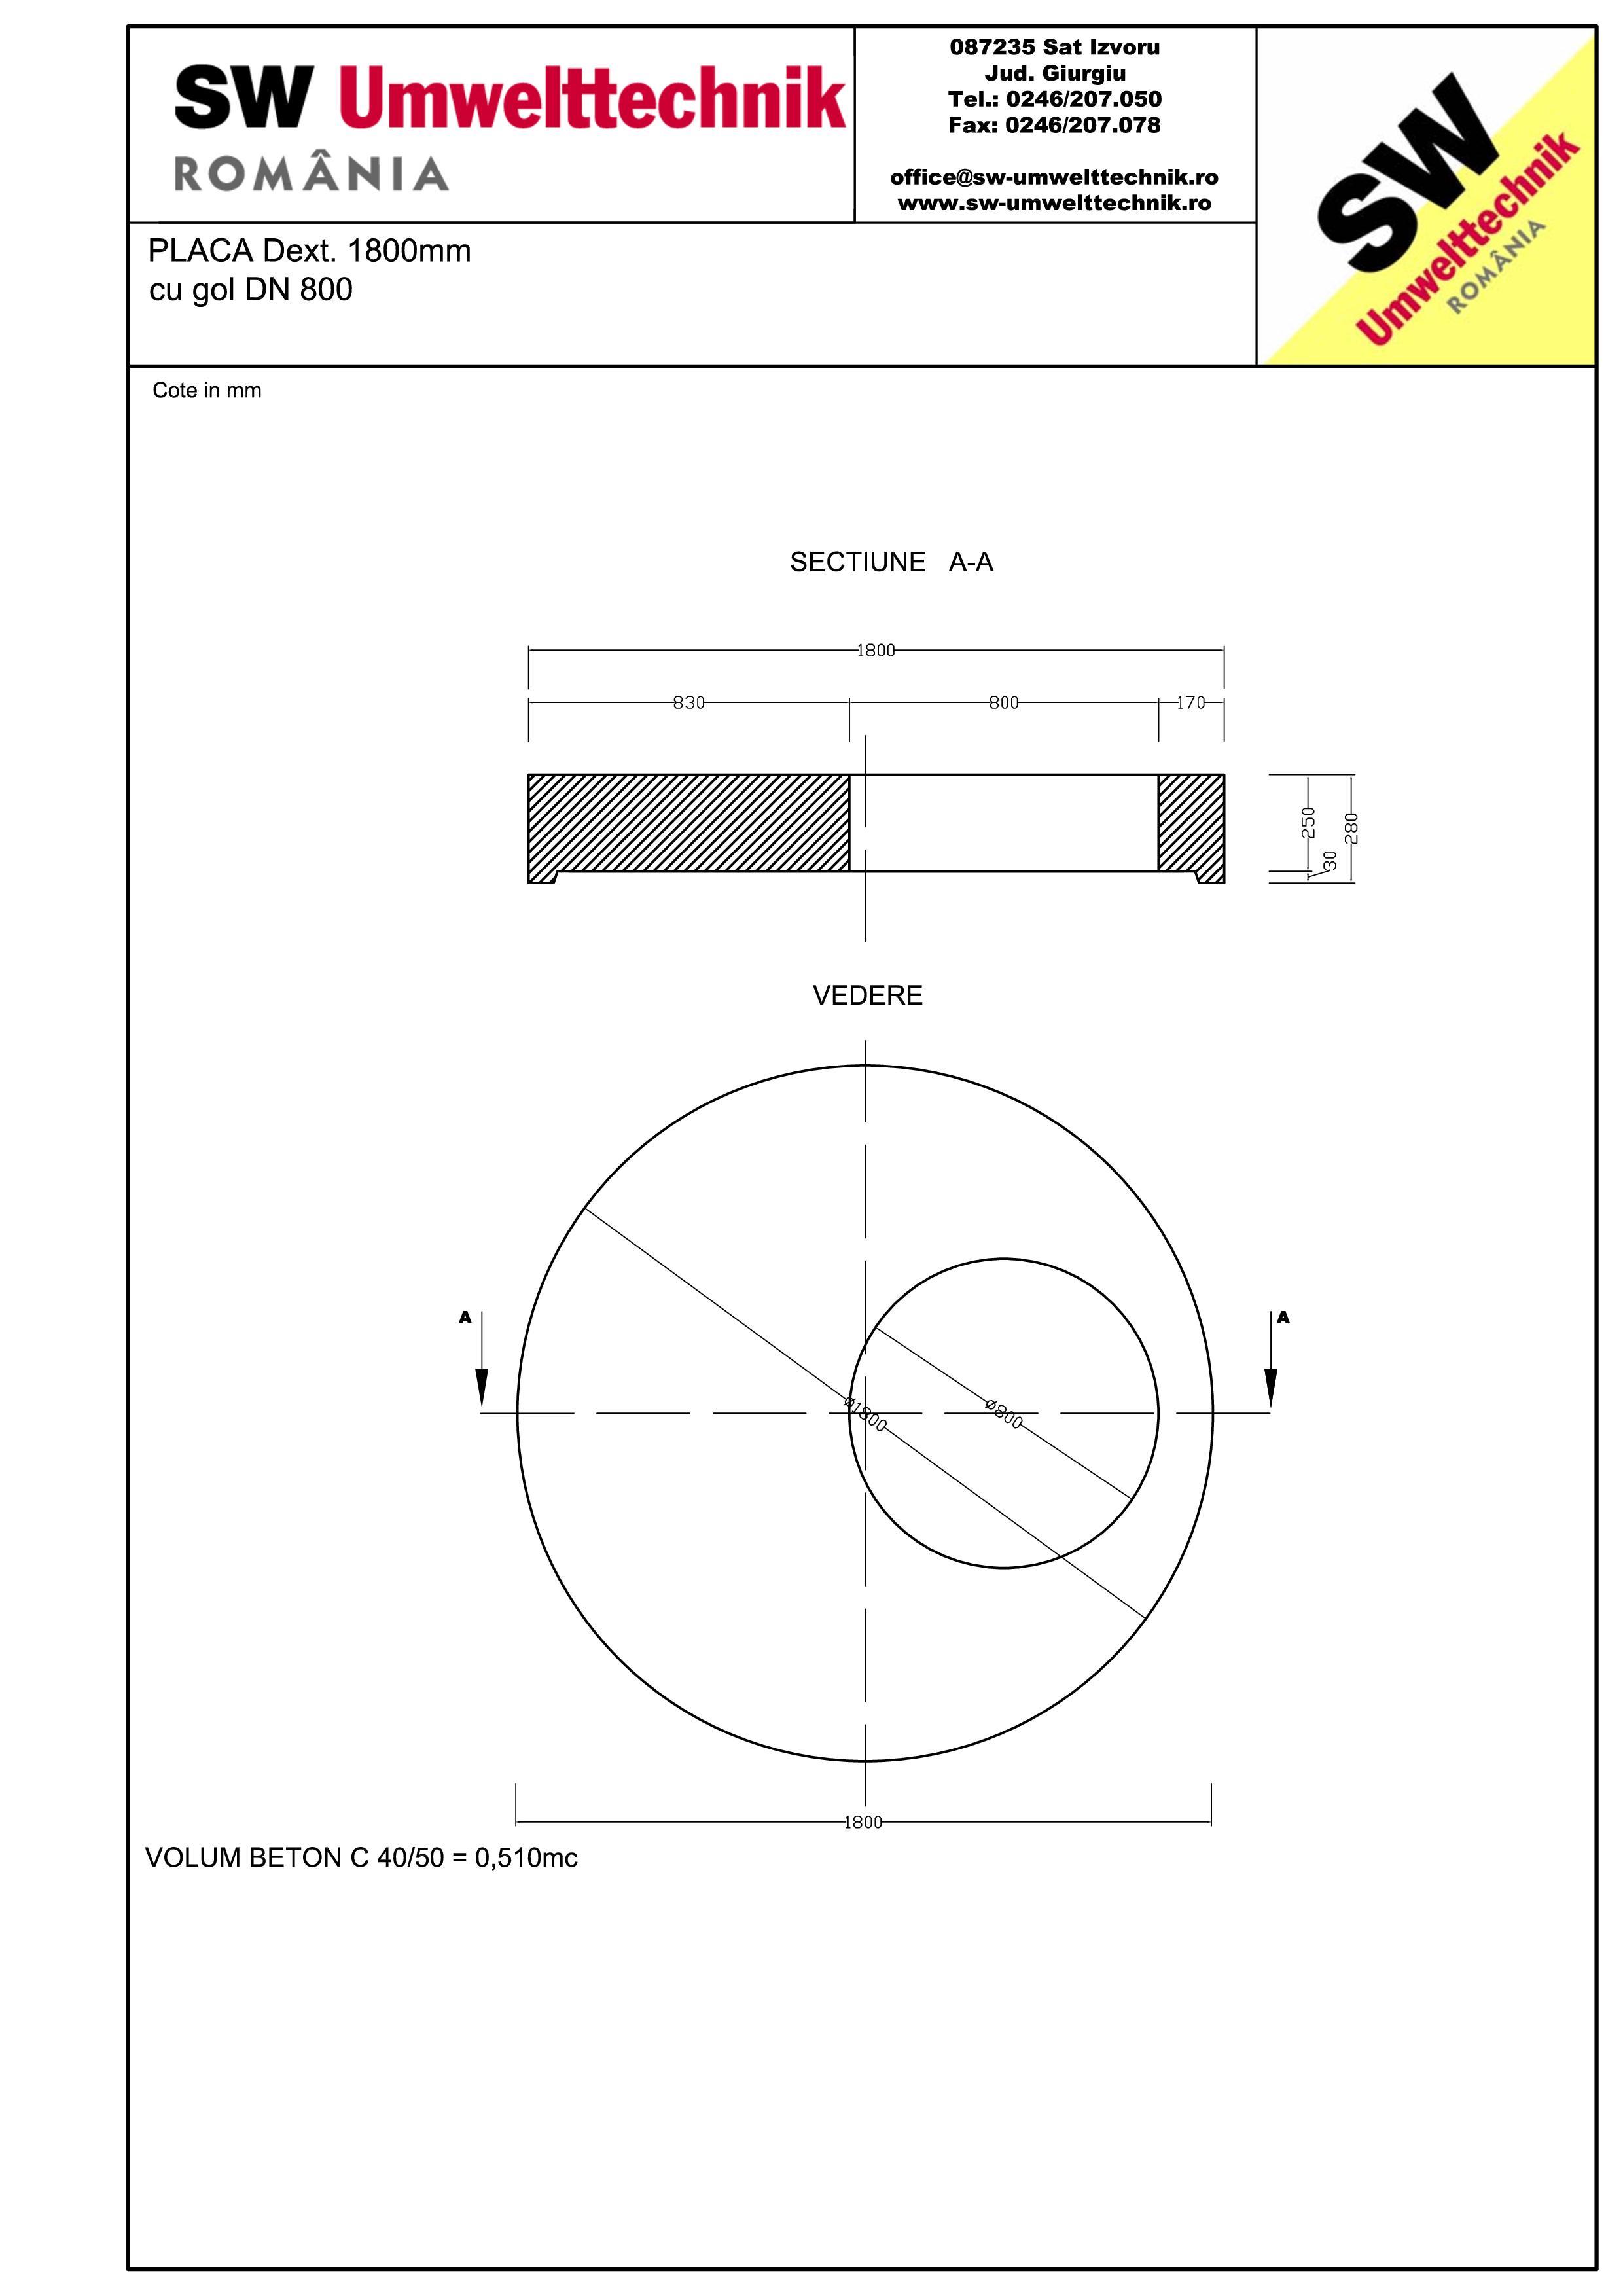 Pagina 1 - CAD-PDF Placa Dext.1800 H250 cu gol DN800 SW UMWELTTECHNIK Detaliu de produs